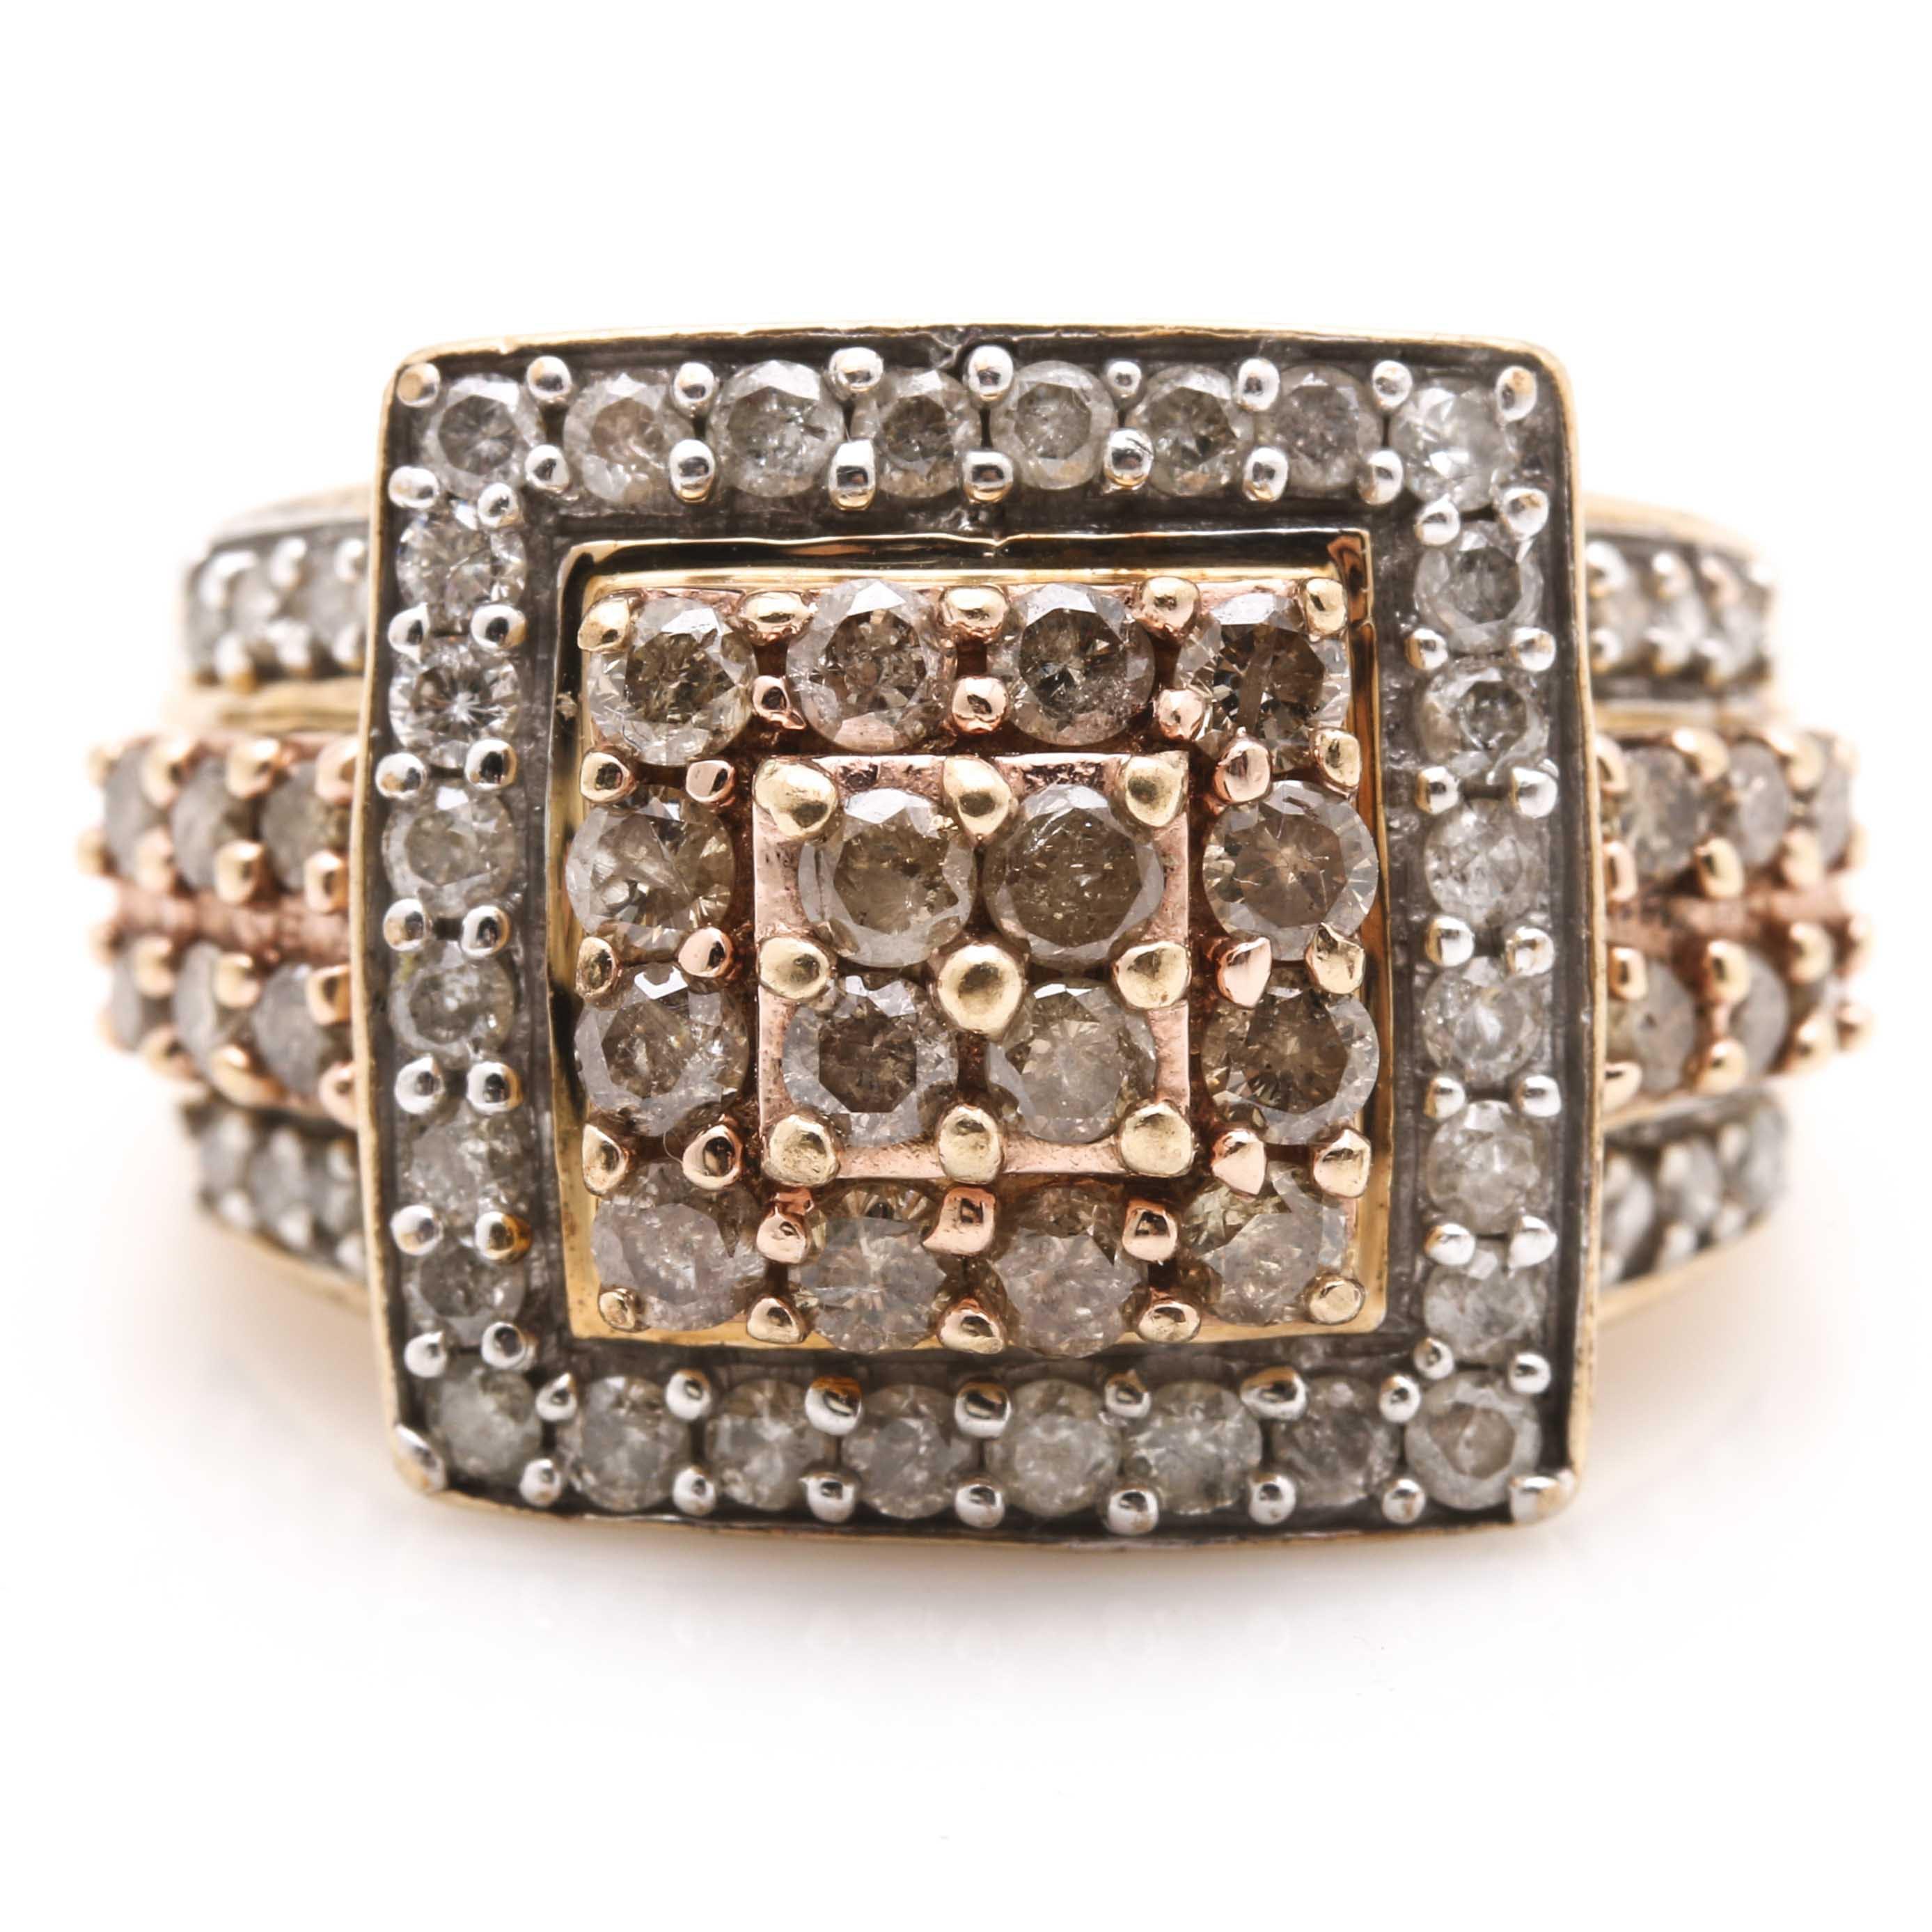 10K Yellow Gold 1.46 CTW Diamond Ring